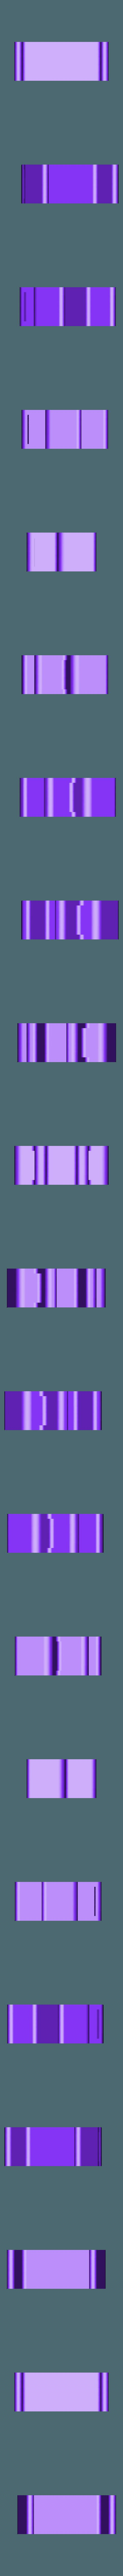 body_20mm.stl Download free STL file Shelf brackets for ivy • 3D printing template, kumekay